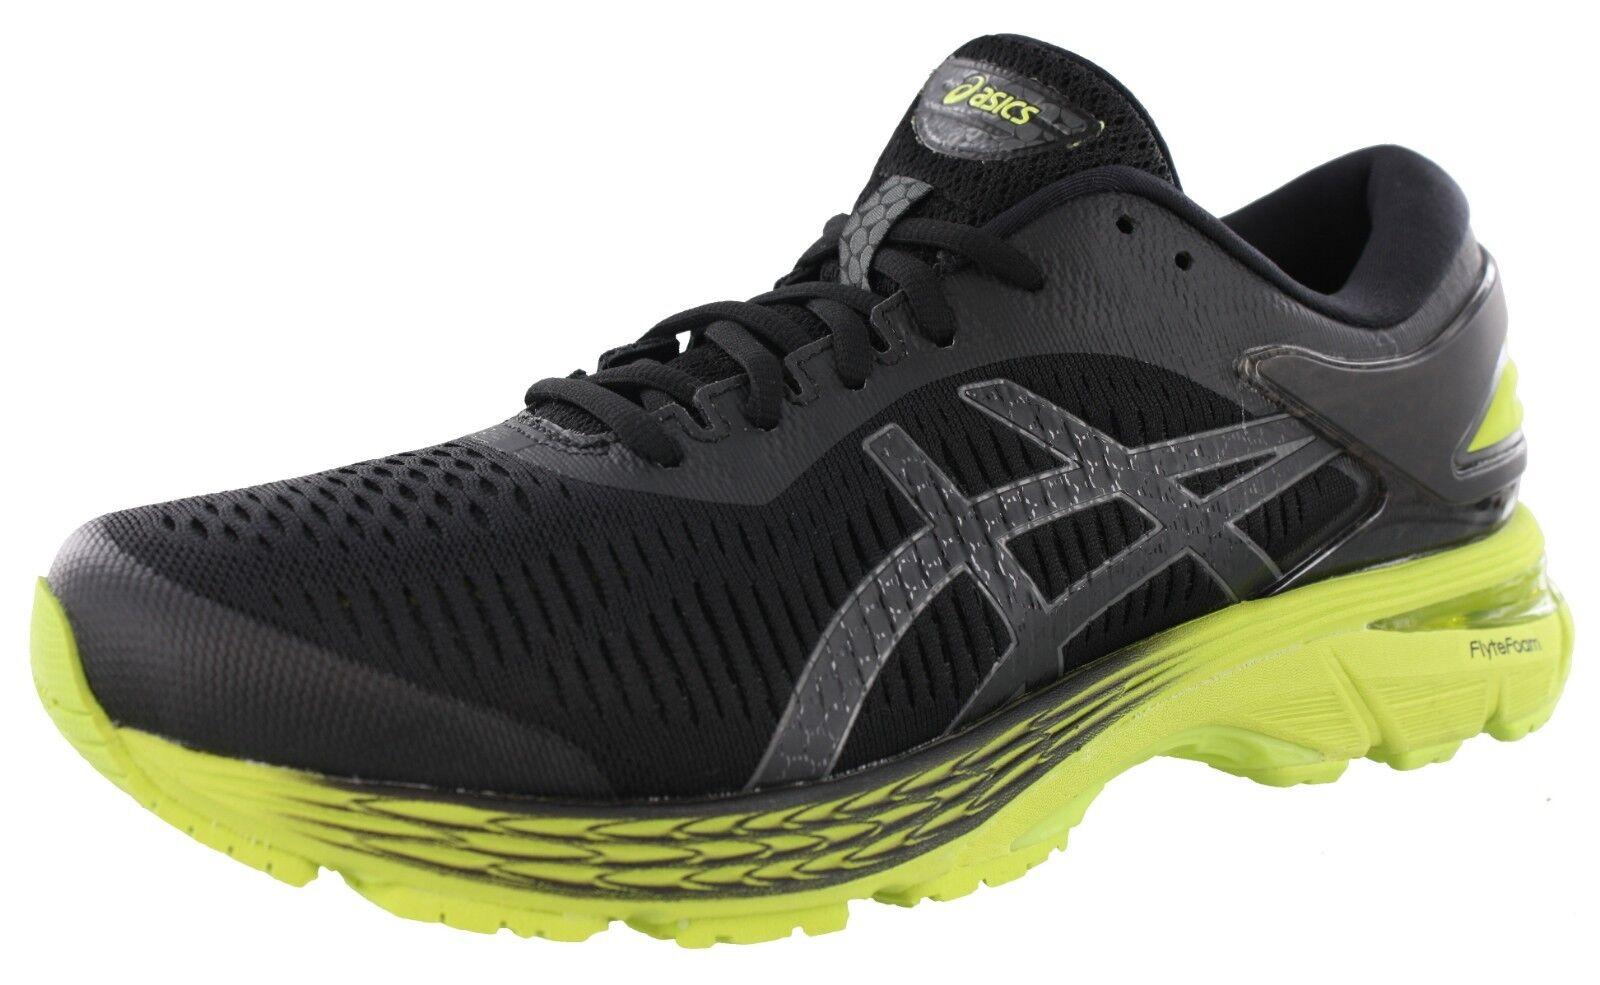 b60c7904477 ASICS GEL Kayano 25 Running Shoes Men's Size 11 Black 1011a019-001 Last Pair